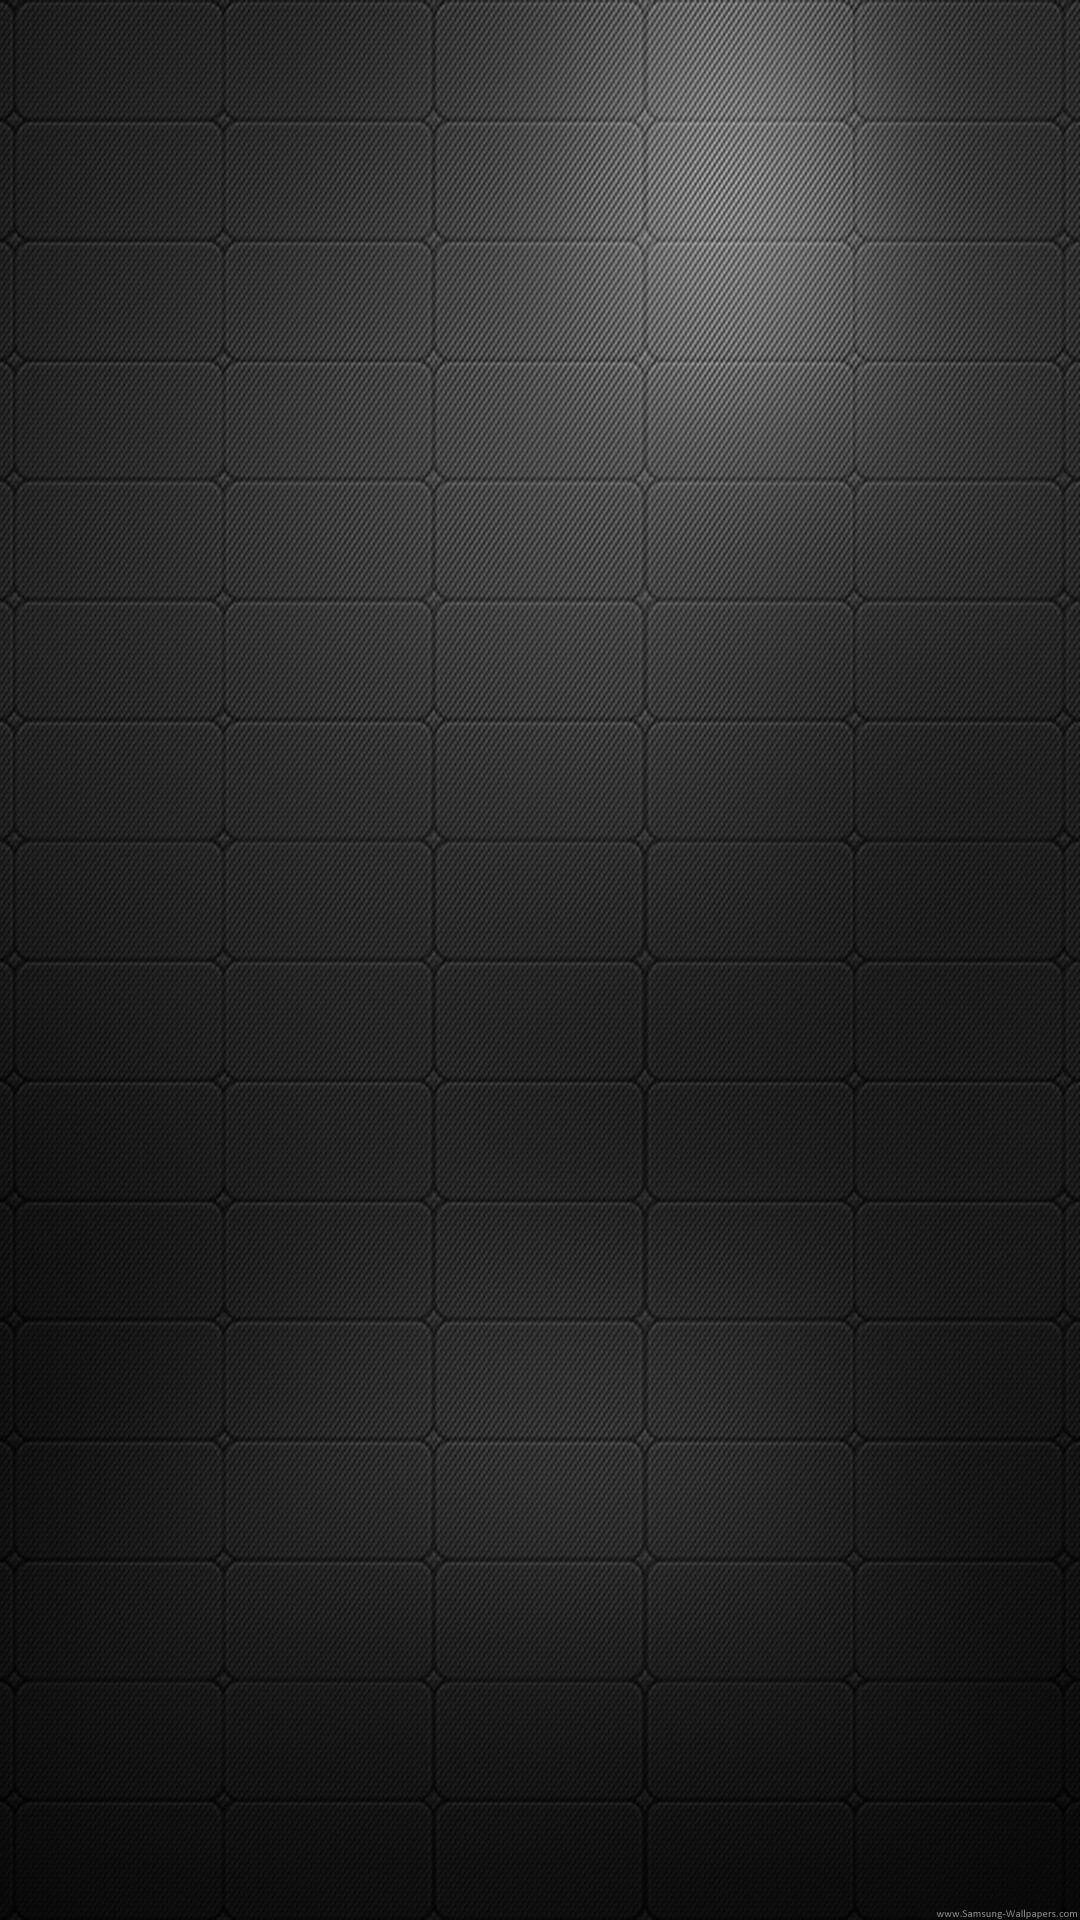 Zastavki Na Telefon Fonovye Izobrazheniya In 2021 Grey Wallpaper Iphone Grey Wallpaper Black Wallpaper Full screen black wallpaper hd download